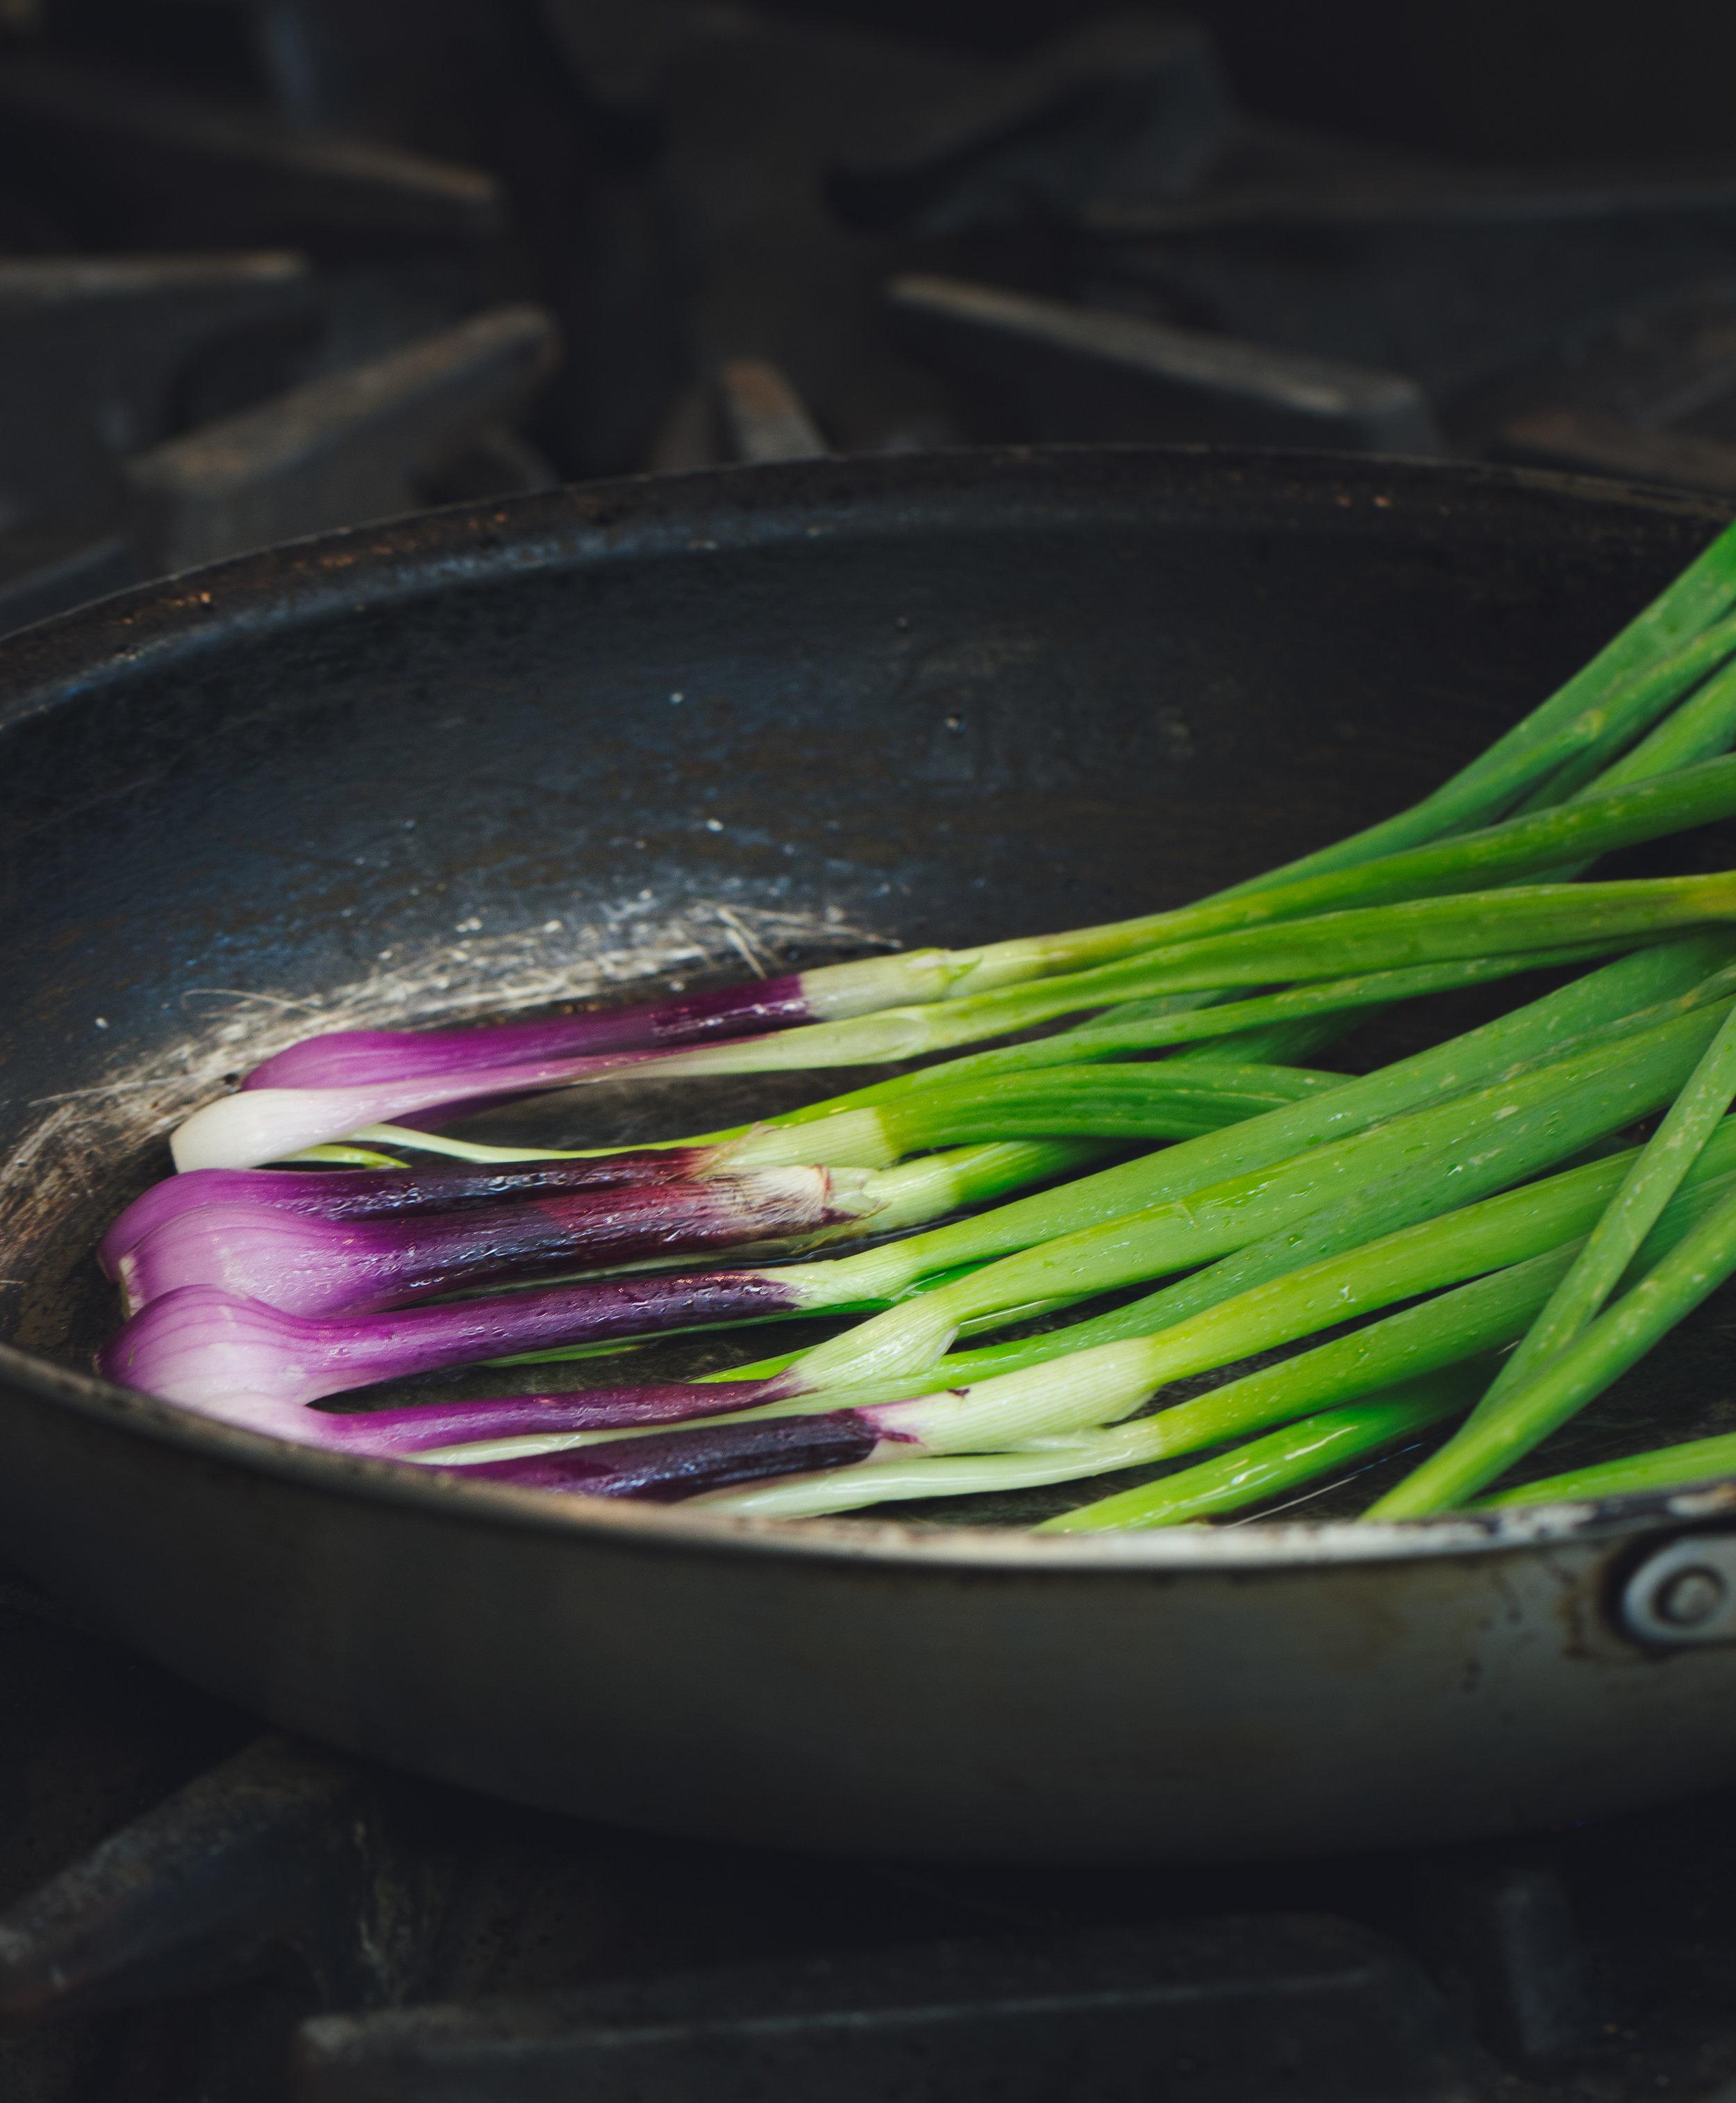 Sautéing Purplette Onions straight from the farm